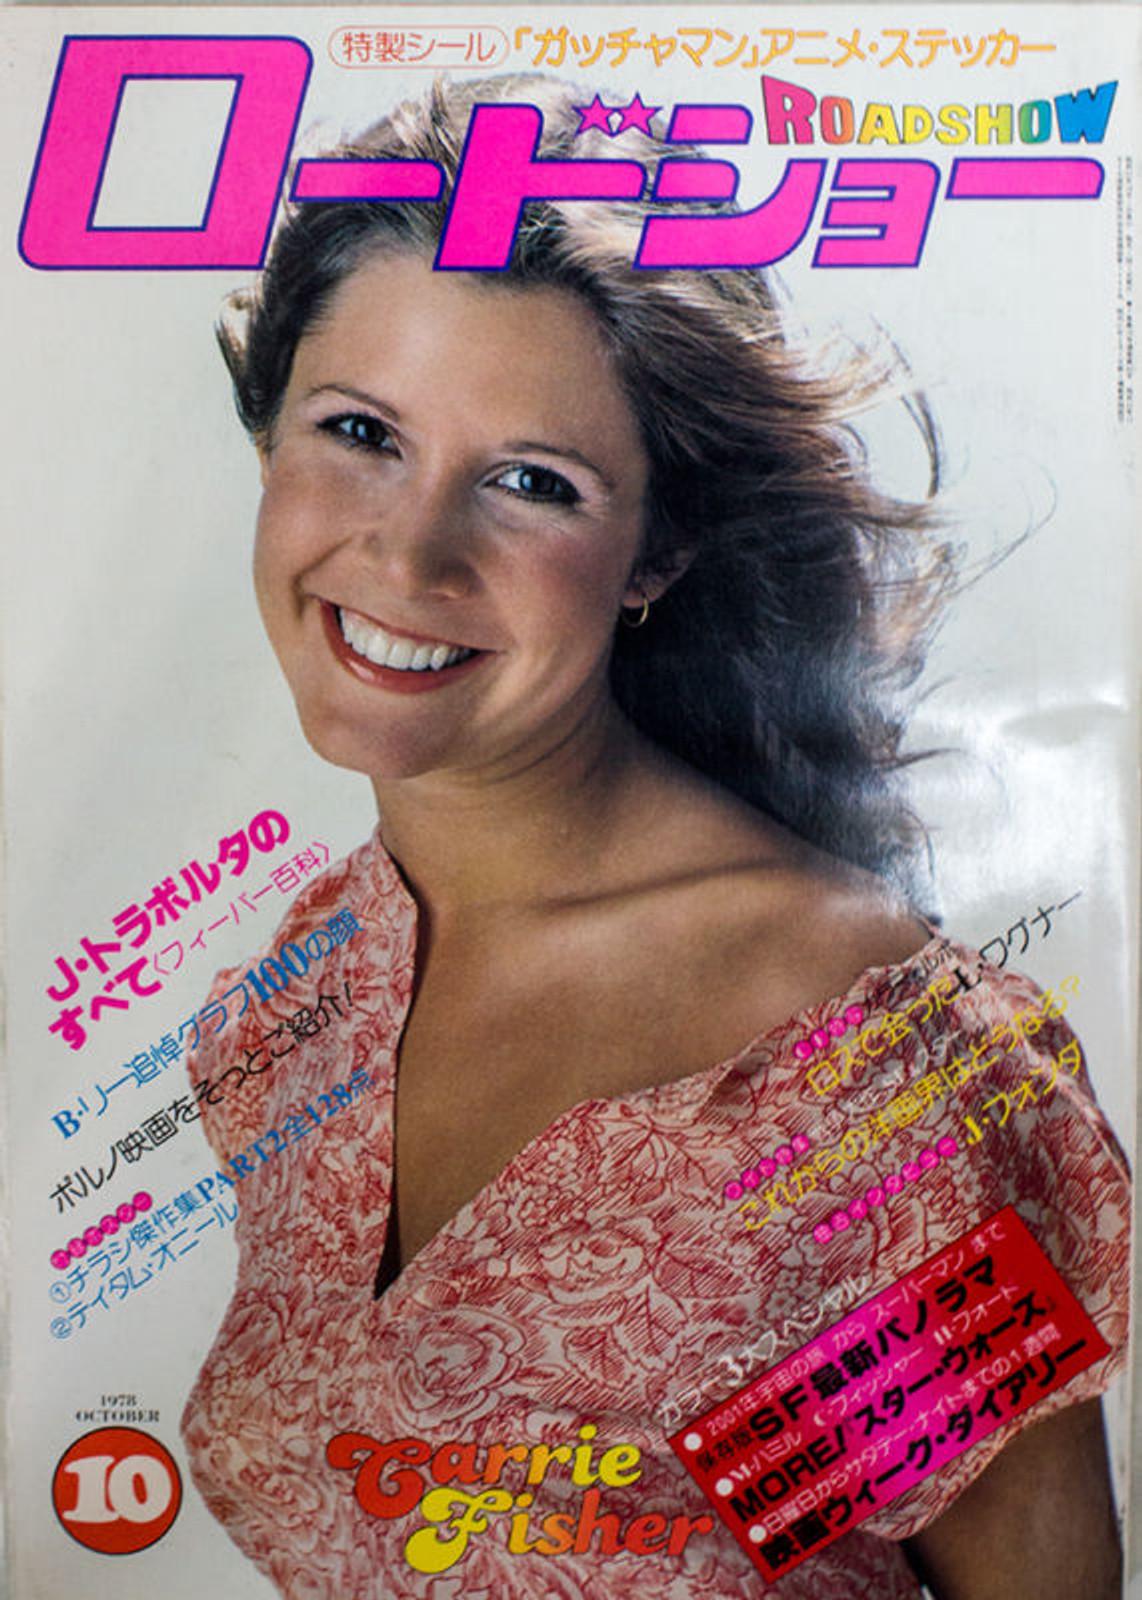 ROADSHOW 10/1978 Japan Movie Magazine CARRIE FISHER/CATRIONA MACCALL/CHERYL LADD